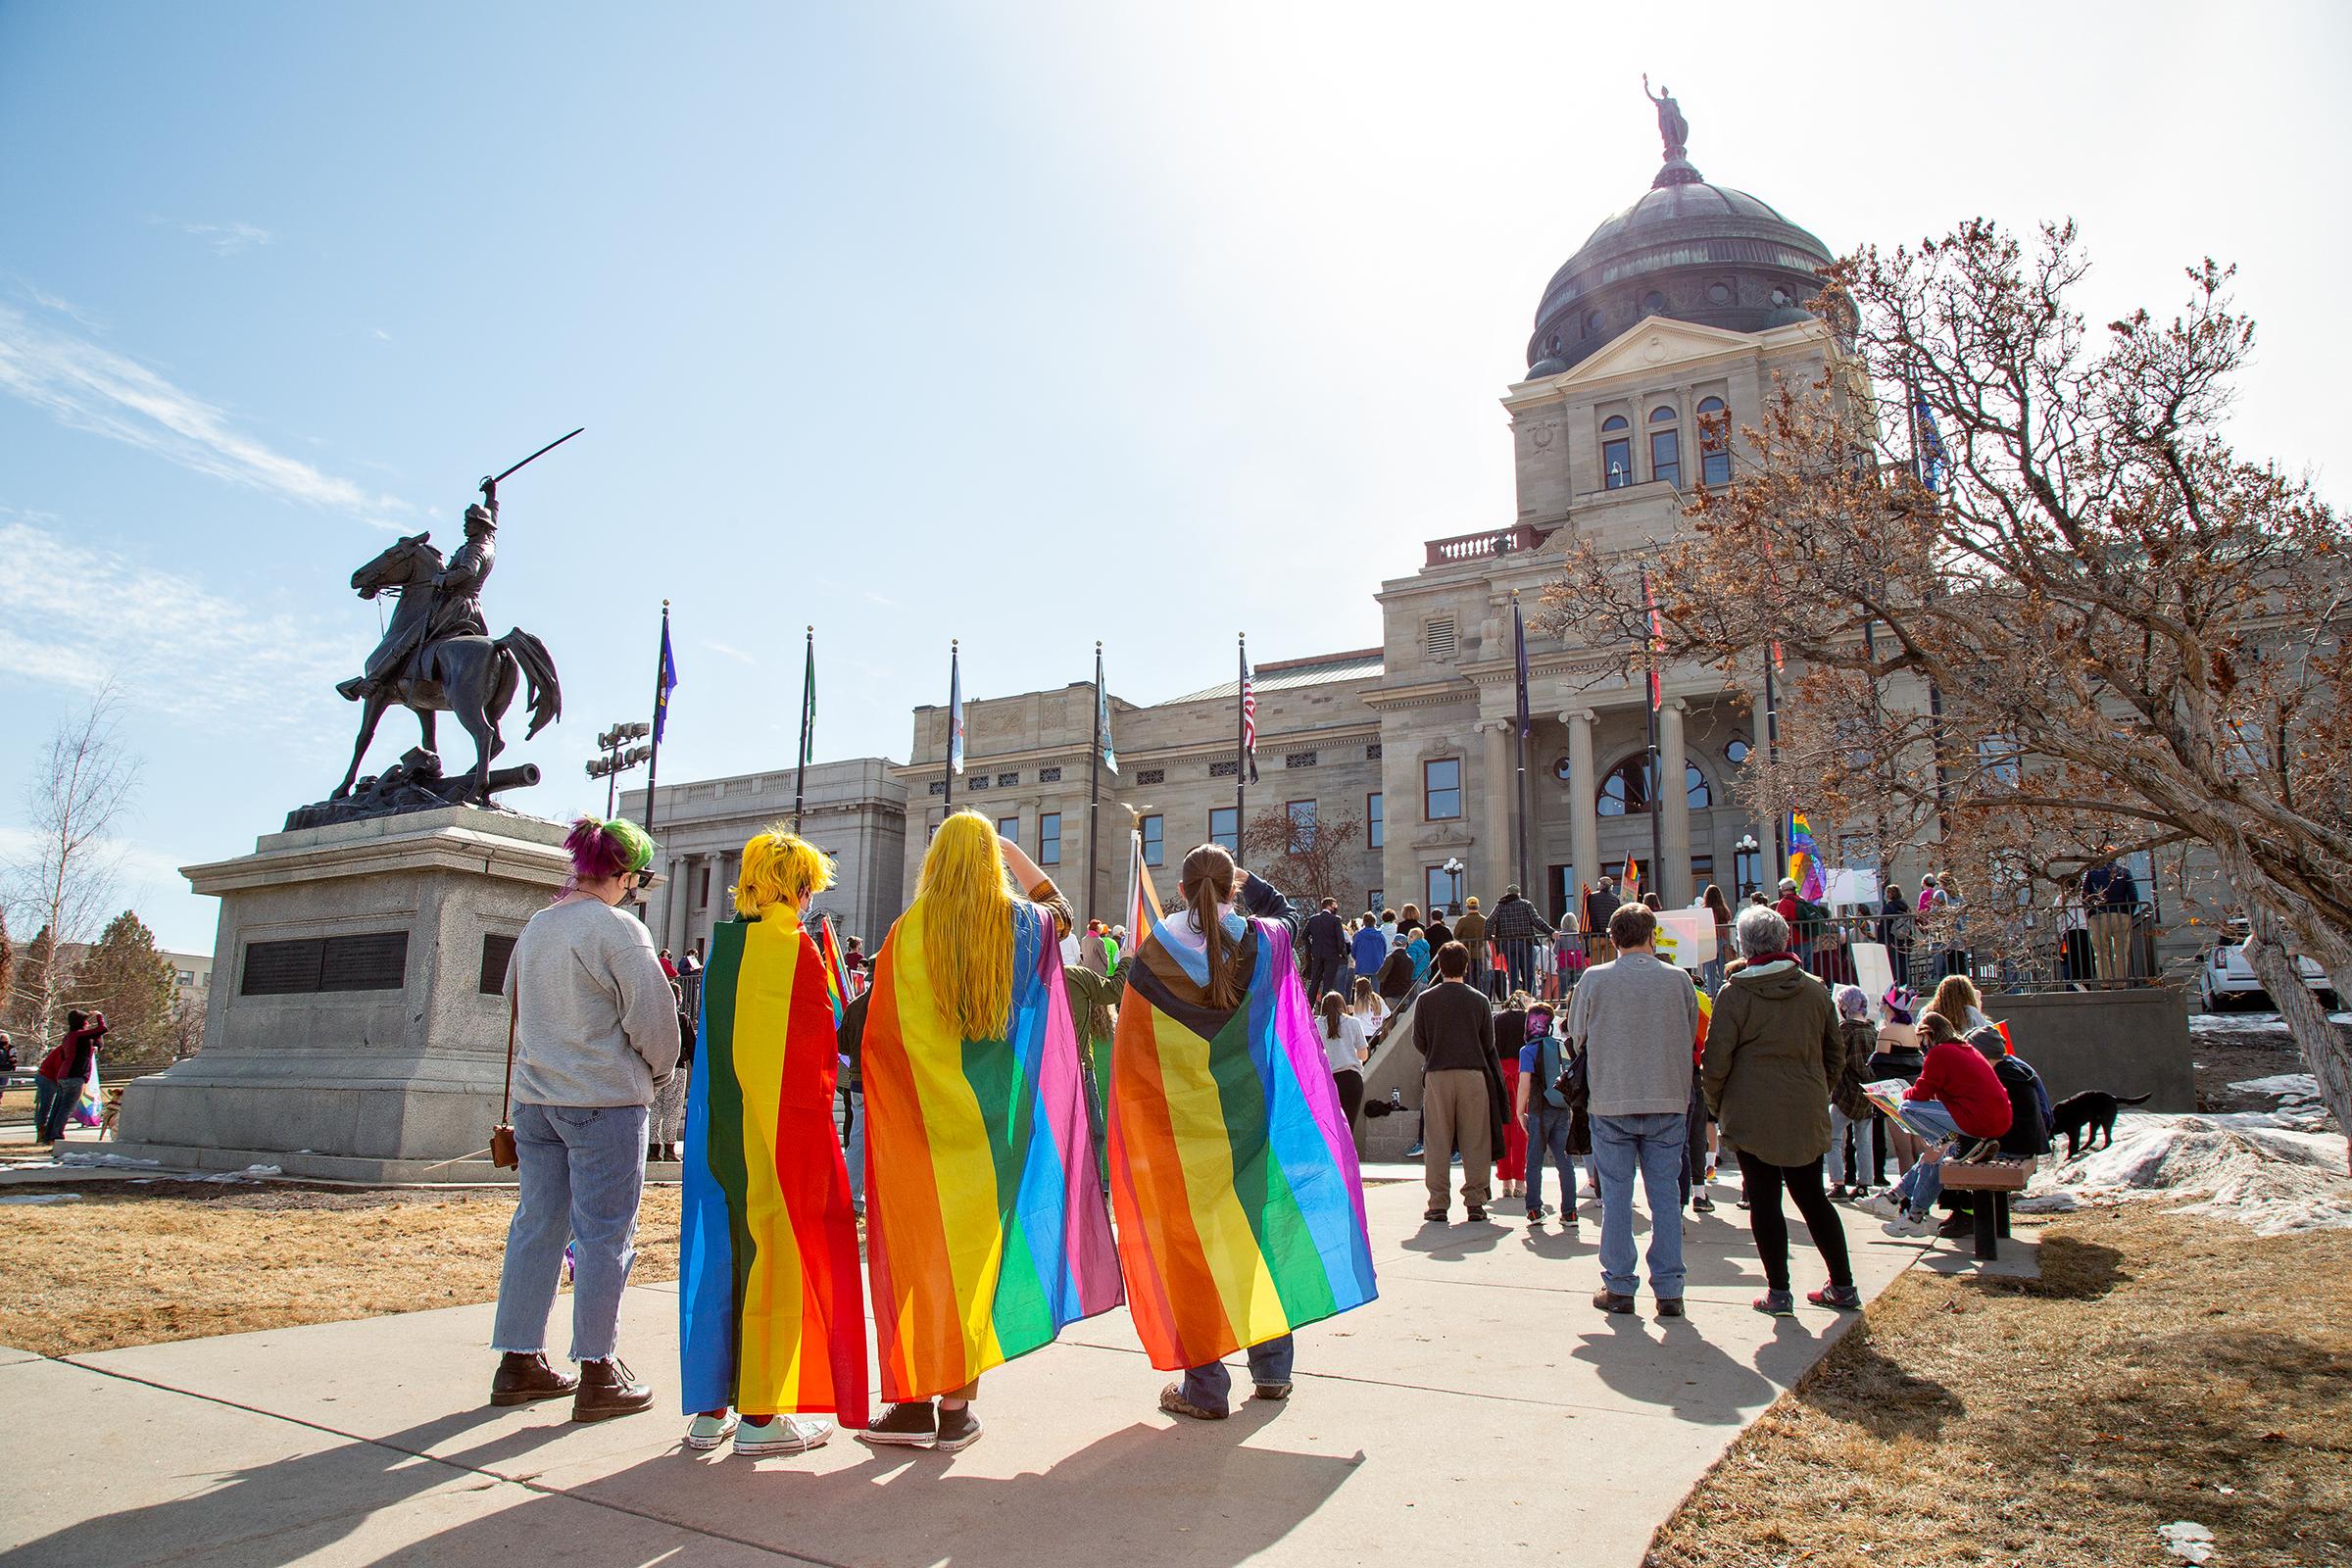 Bill regulating transgender youth healthcare gets postponed with surprise motion